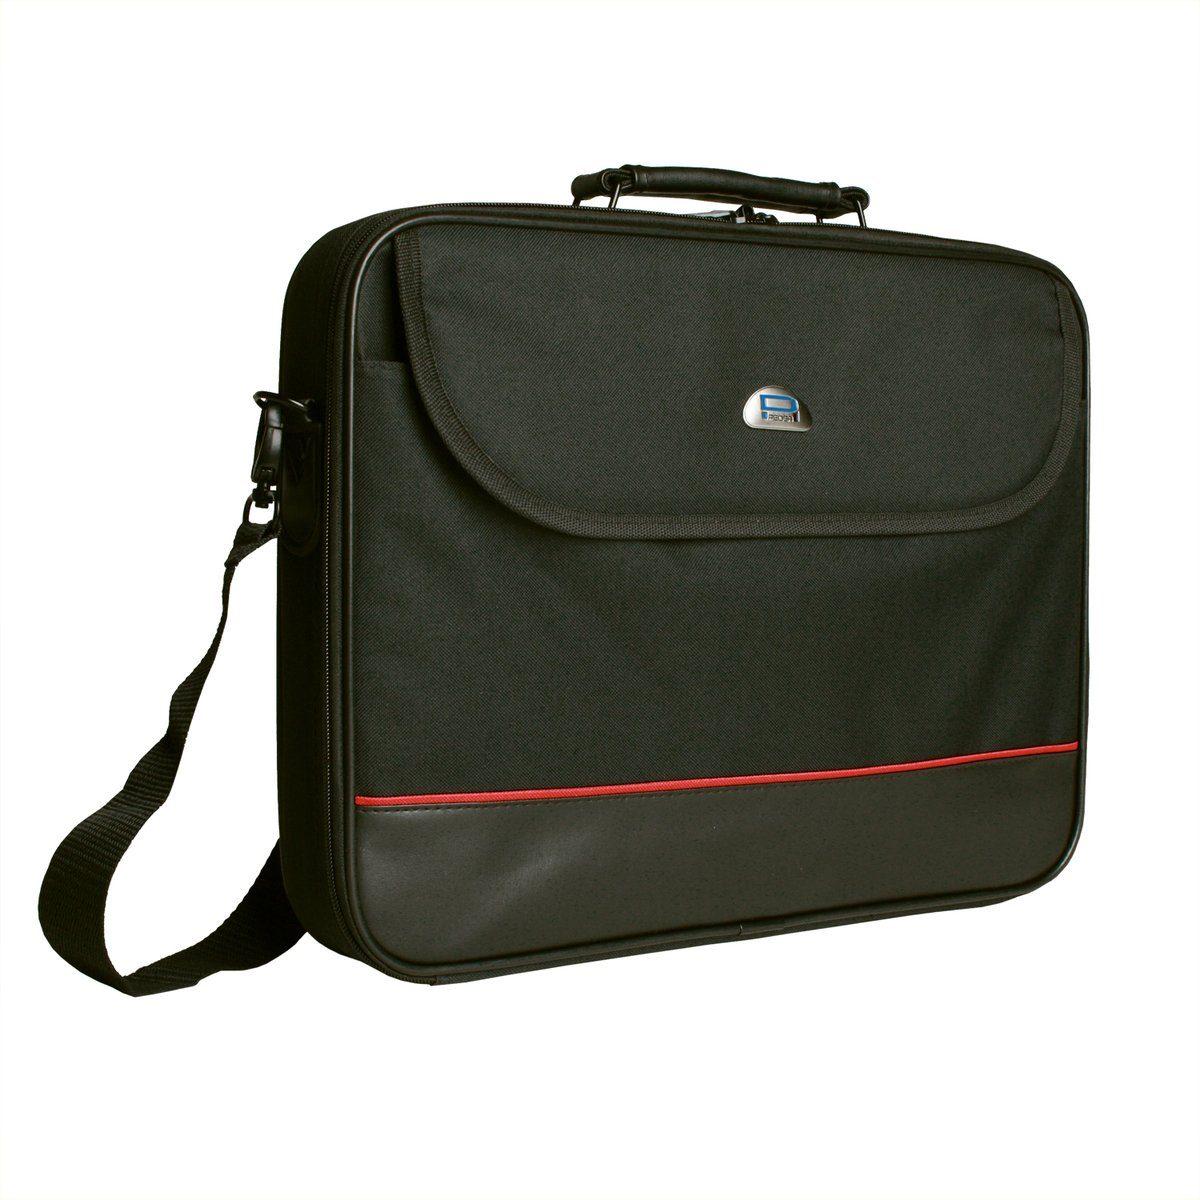 "PEDEA Notebooktasche »TRENDLINE 17,3"" (43,9 cm)«"